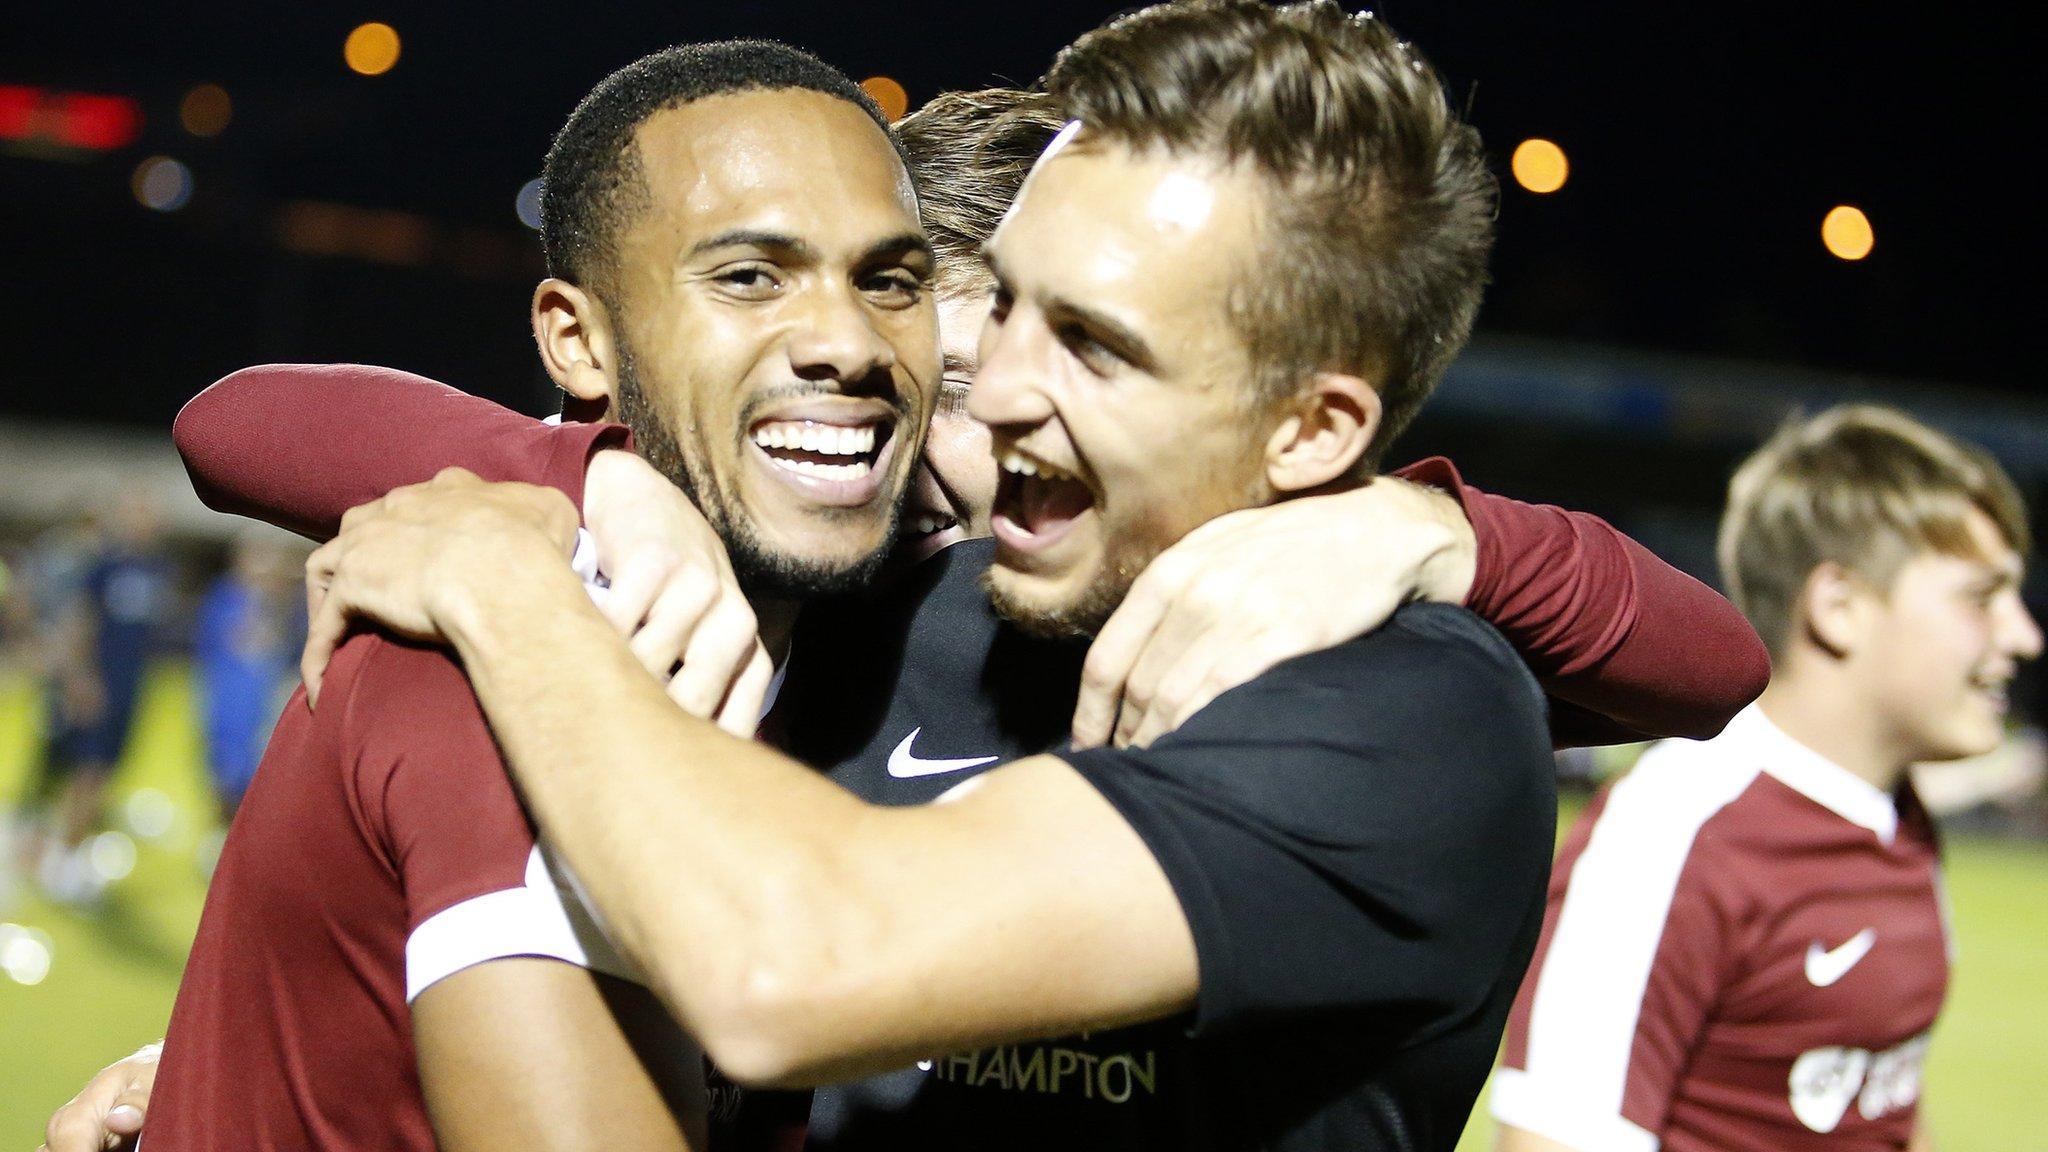 Northampton to host Man Utd in EFL Cup third round